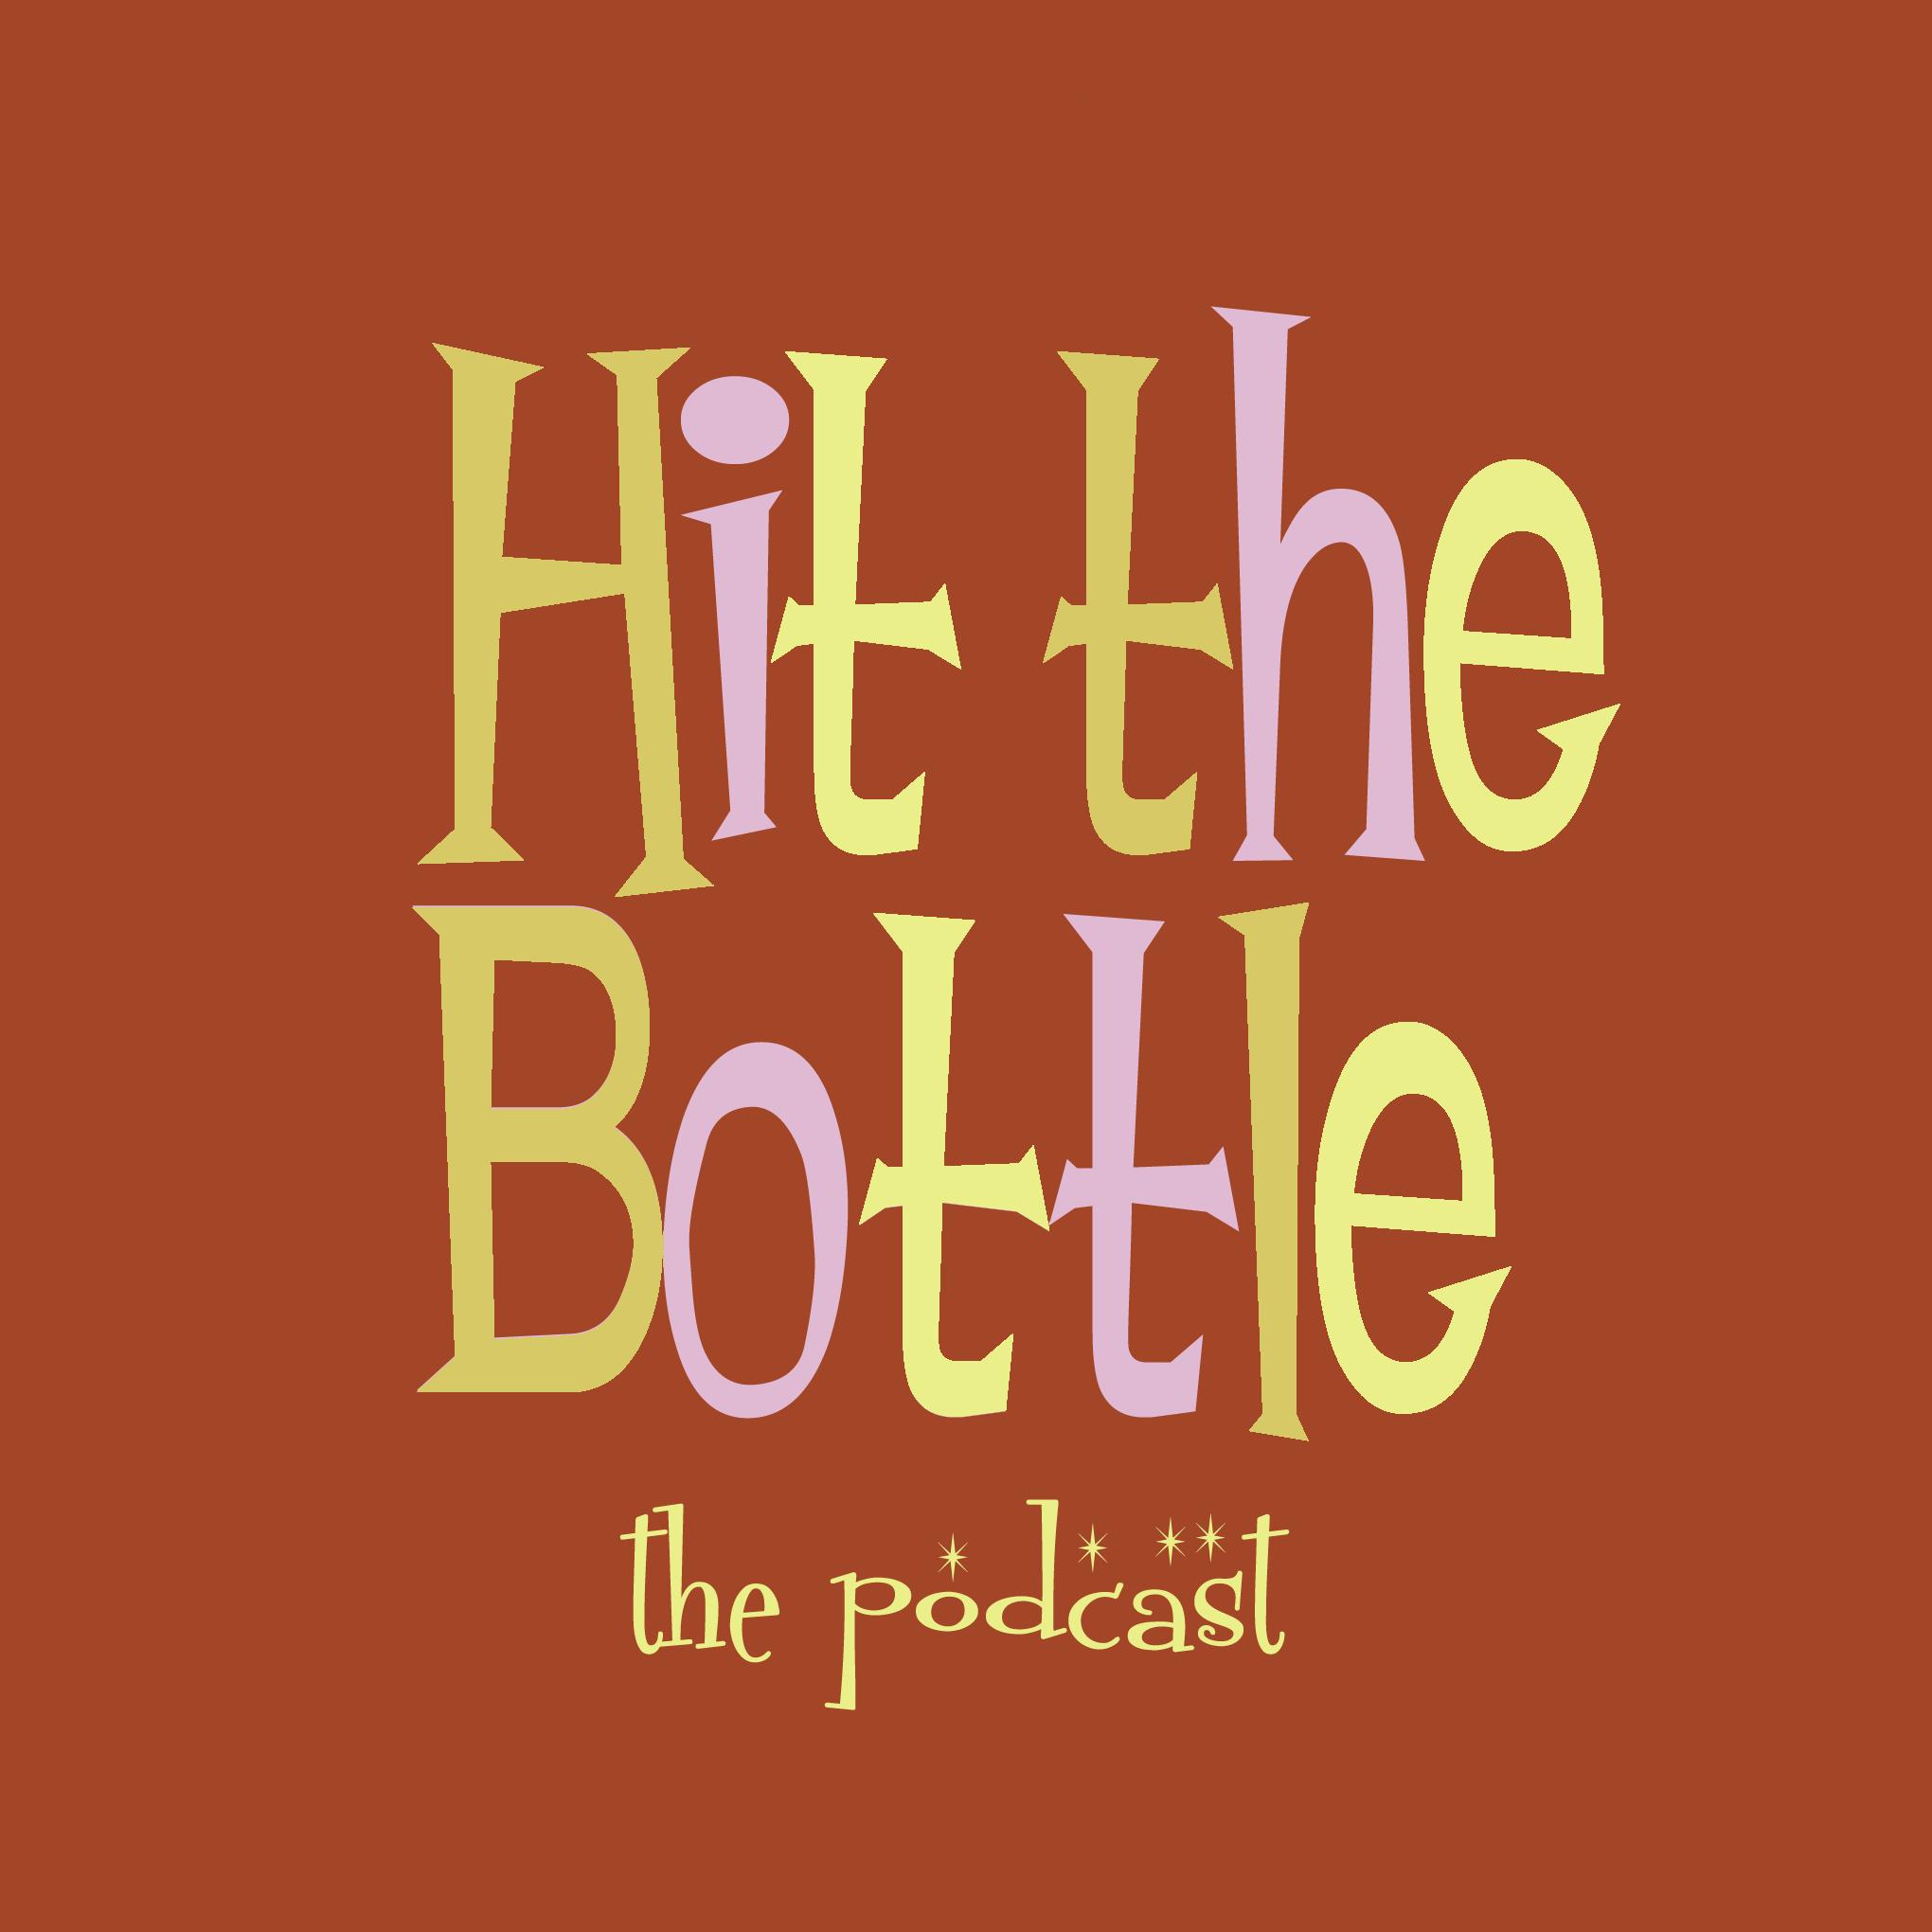 Hit the Bottle Podcast